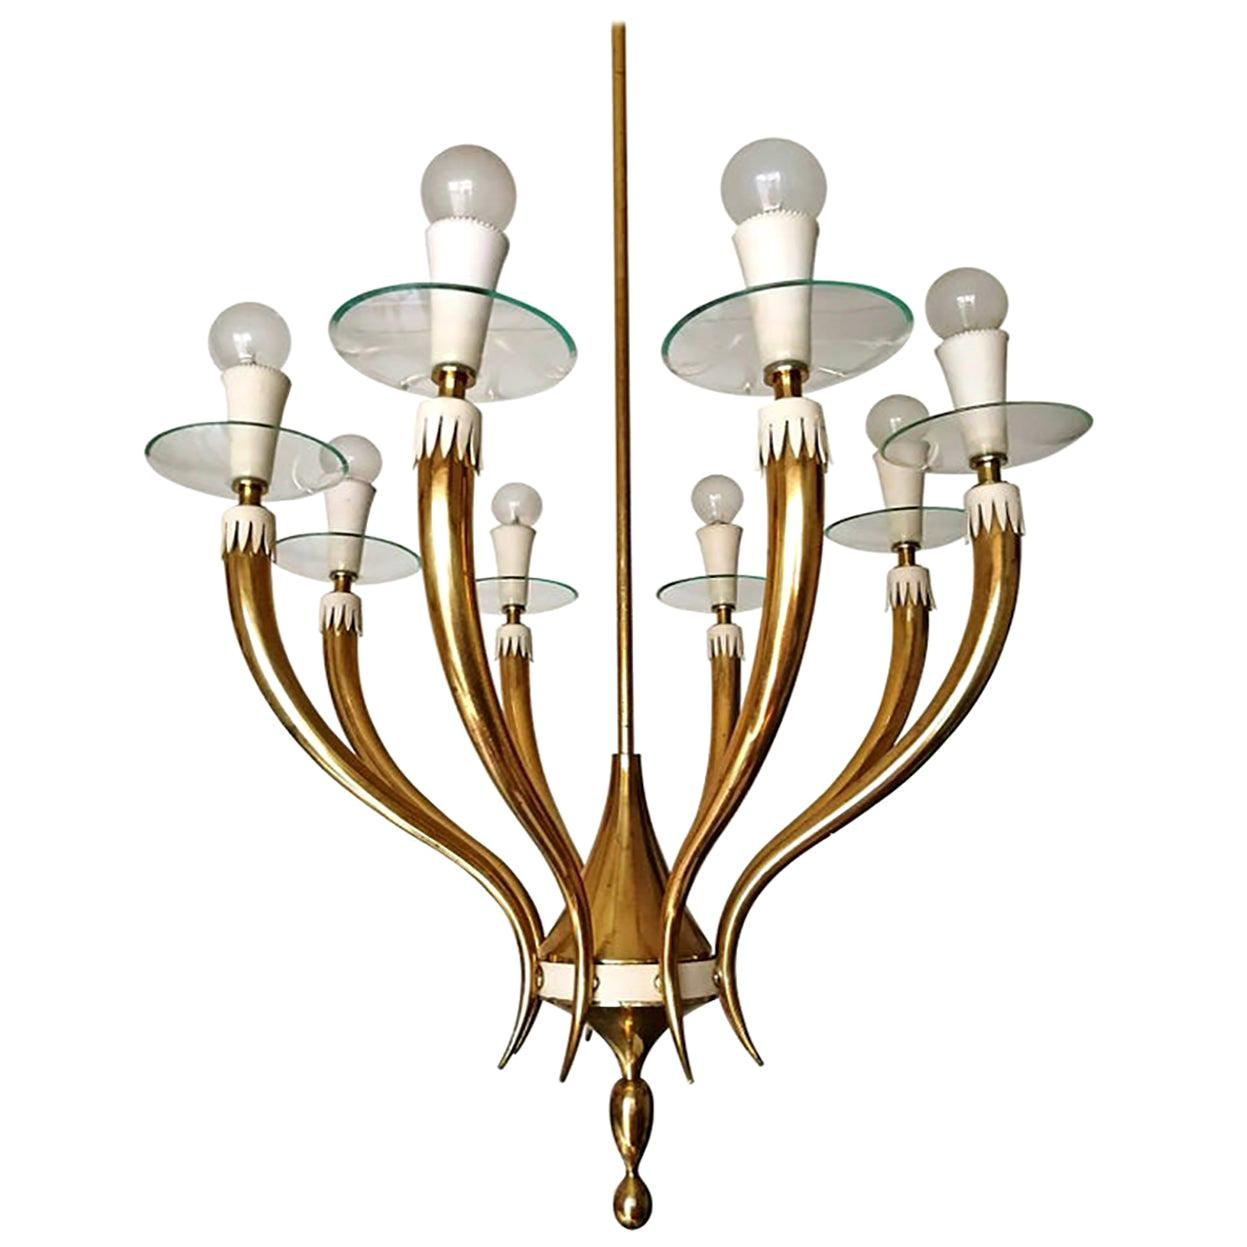 Italian Midcentury Gio Ponti for Fontana Art Glass Gilt Brass 8-Light Chandelier